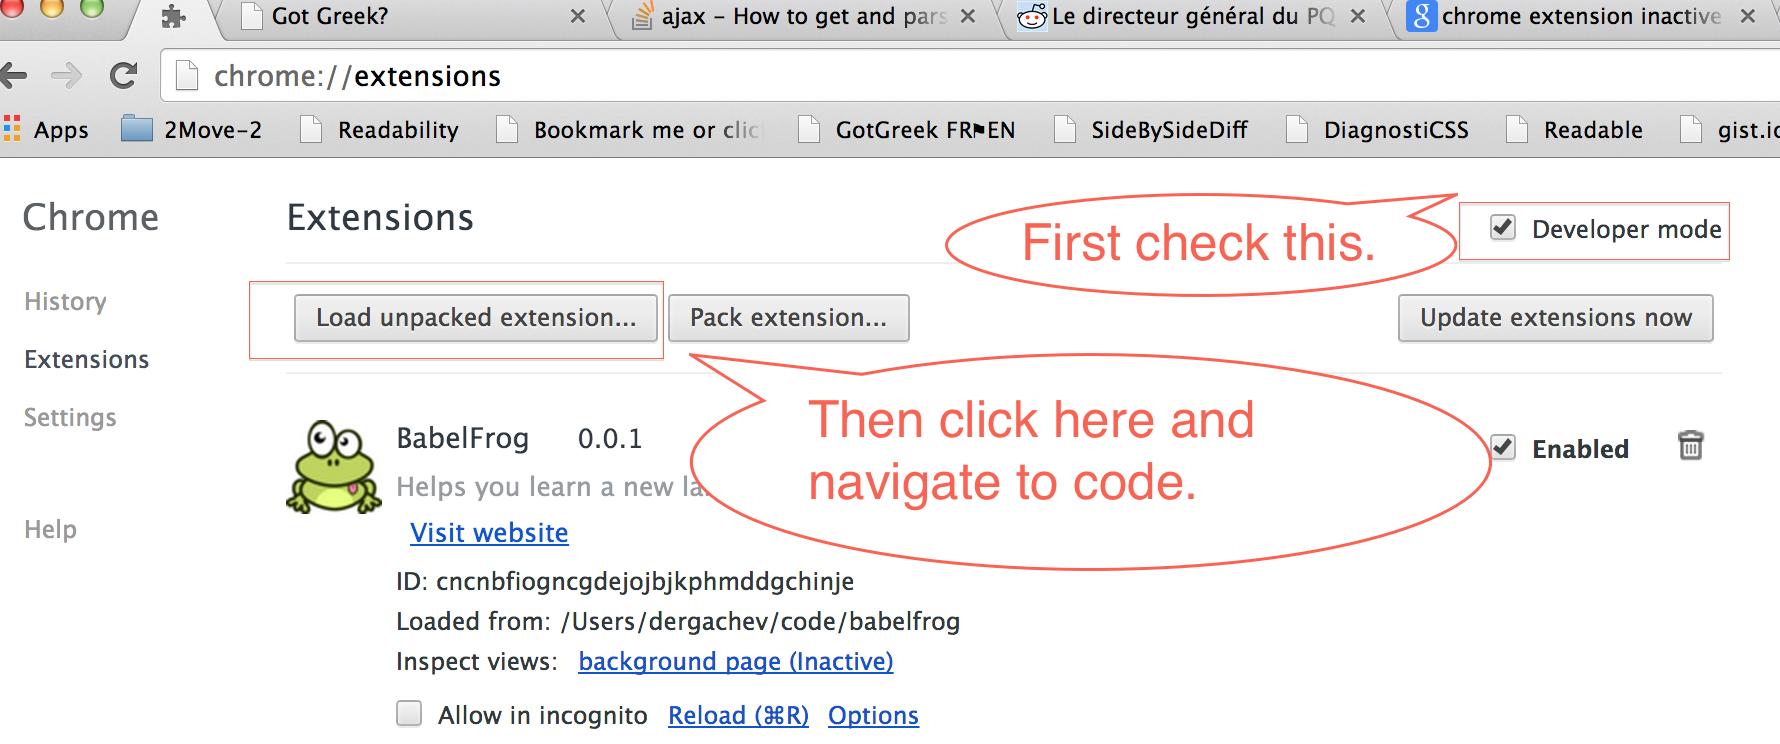 GitHub - dergachev/babelfrog: Chrome extension to help learn